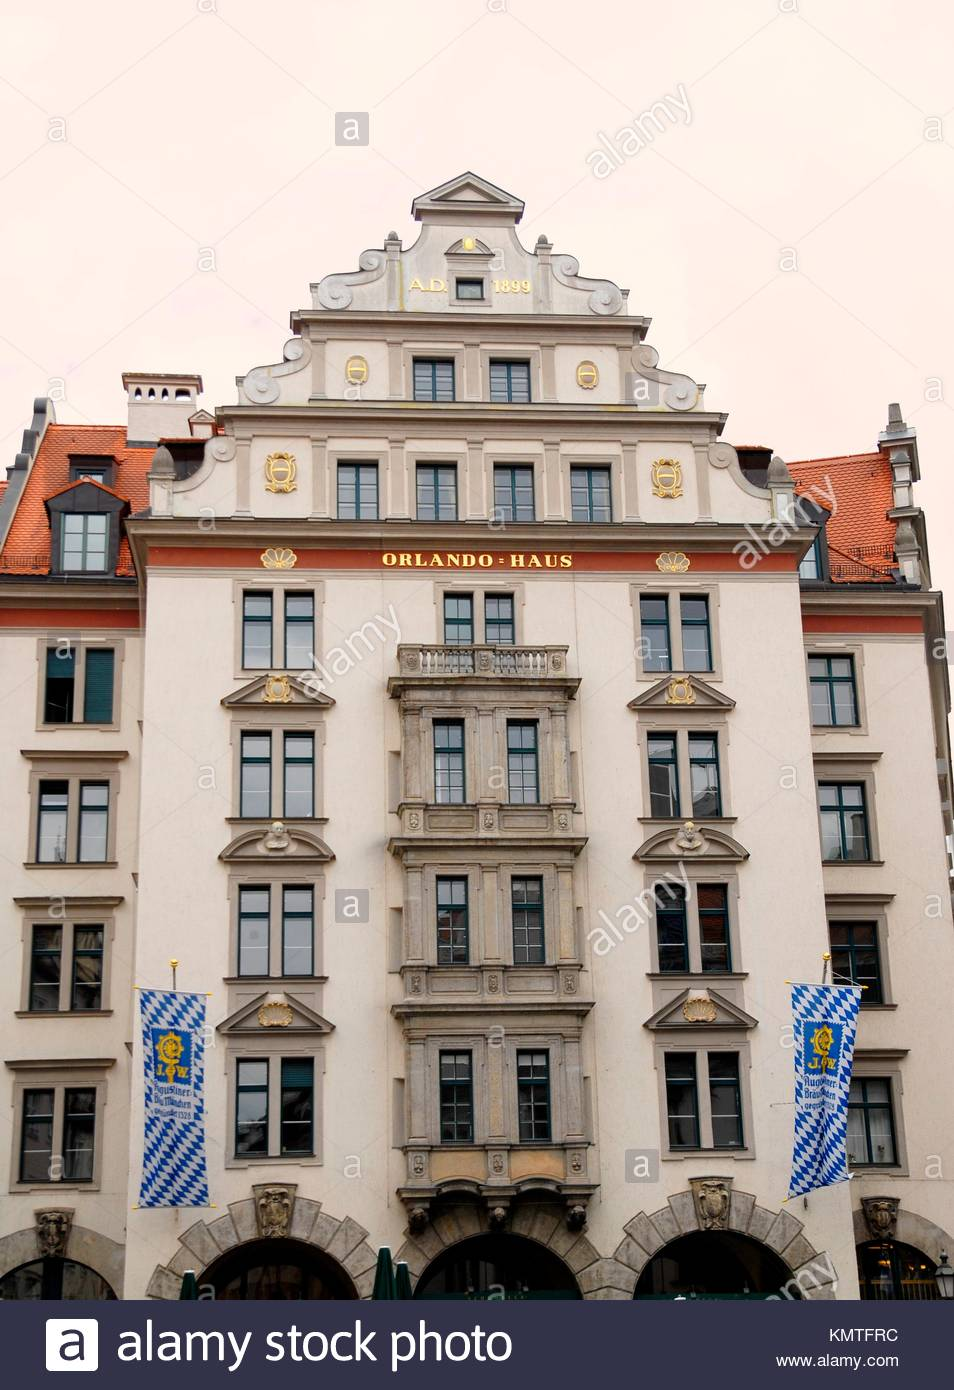 Orlando Haus orlando haus opposite hofbraeuhaus munich bavaria germany europe